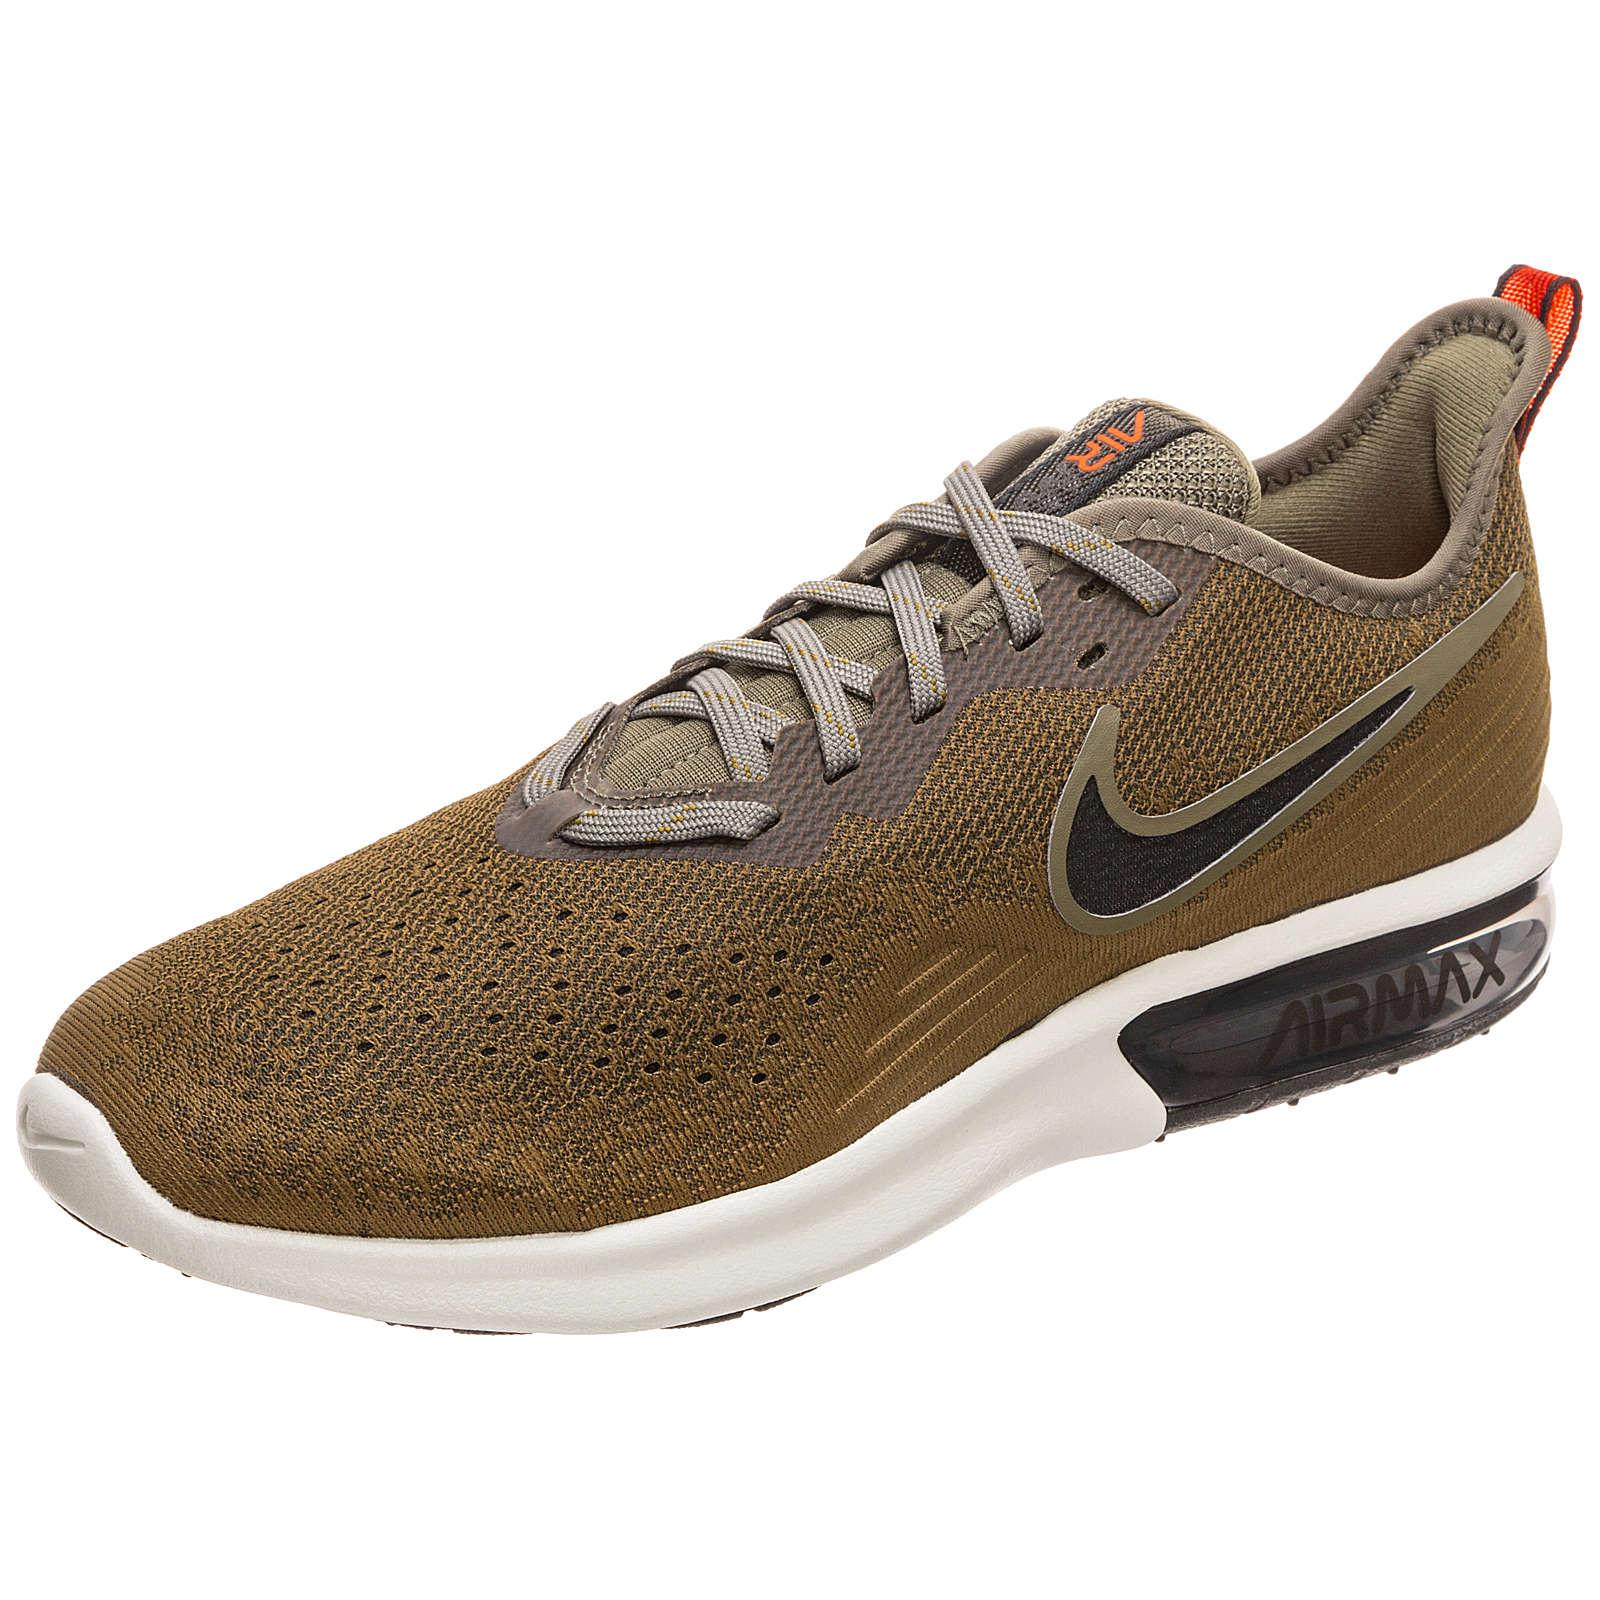 Nike Sportswear Air Max Sequent 4 Sneaker Damen grün Damen Gr. 42